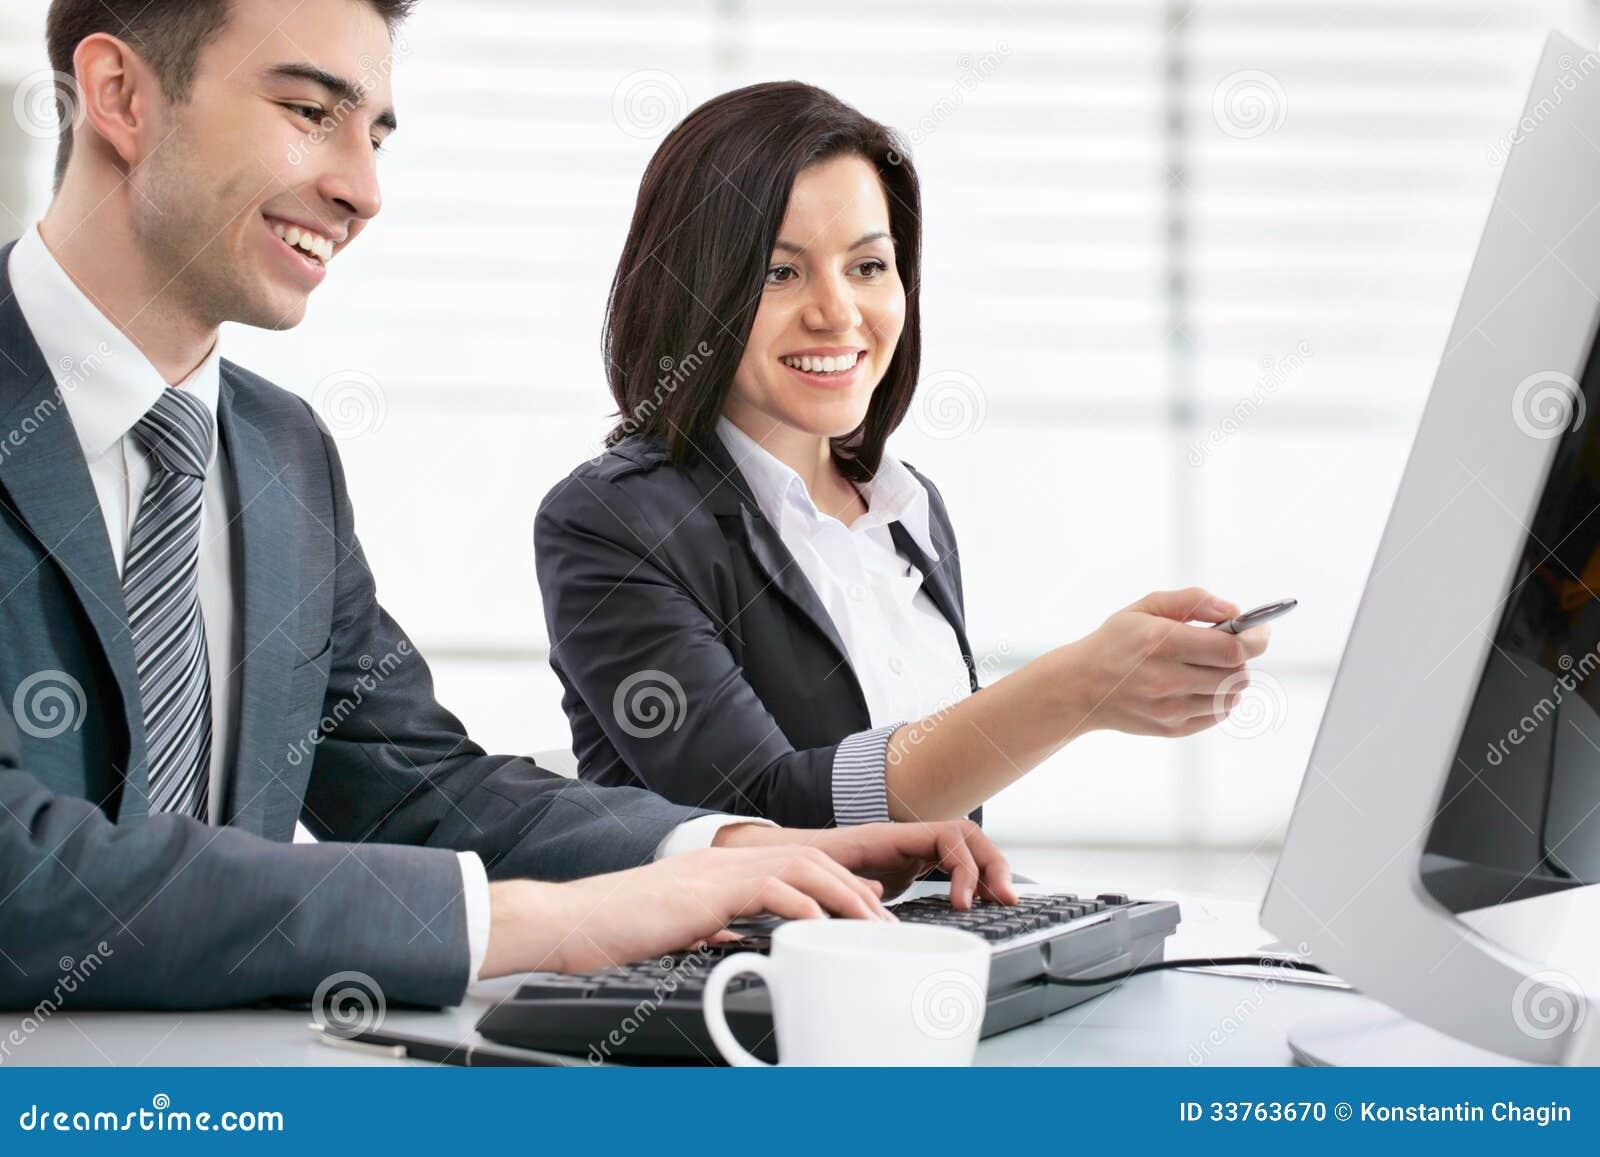 Business People Stock Photo - Image: 33763670